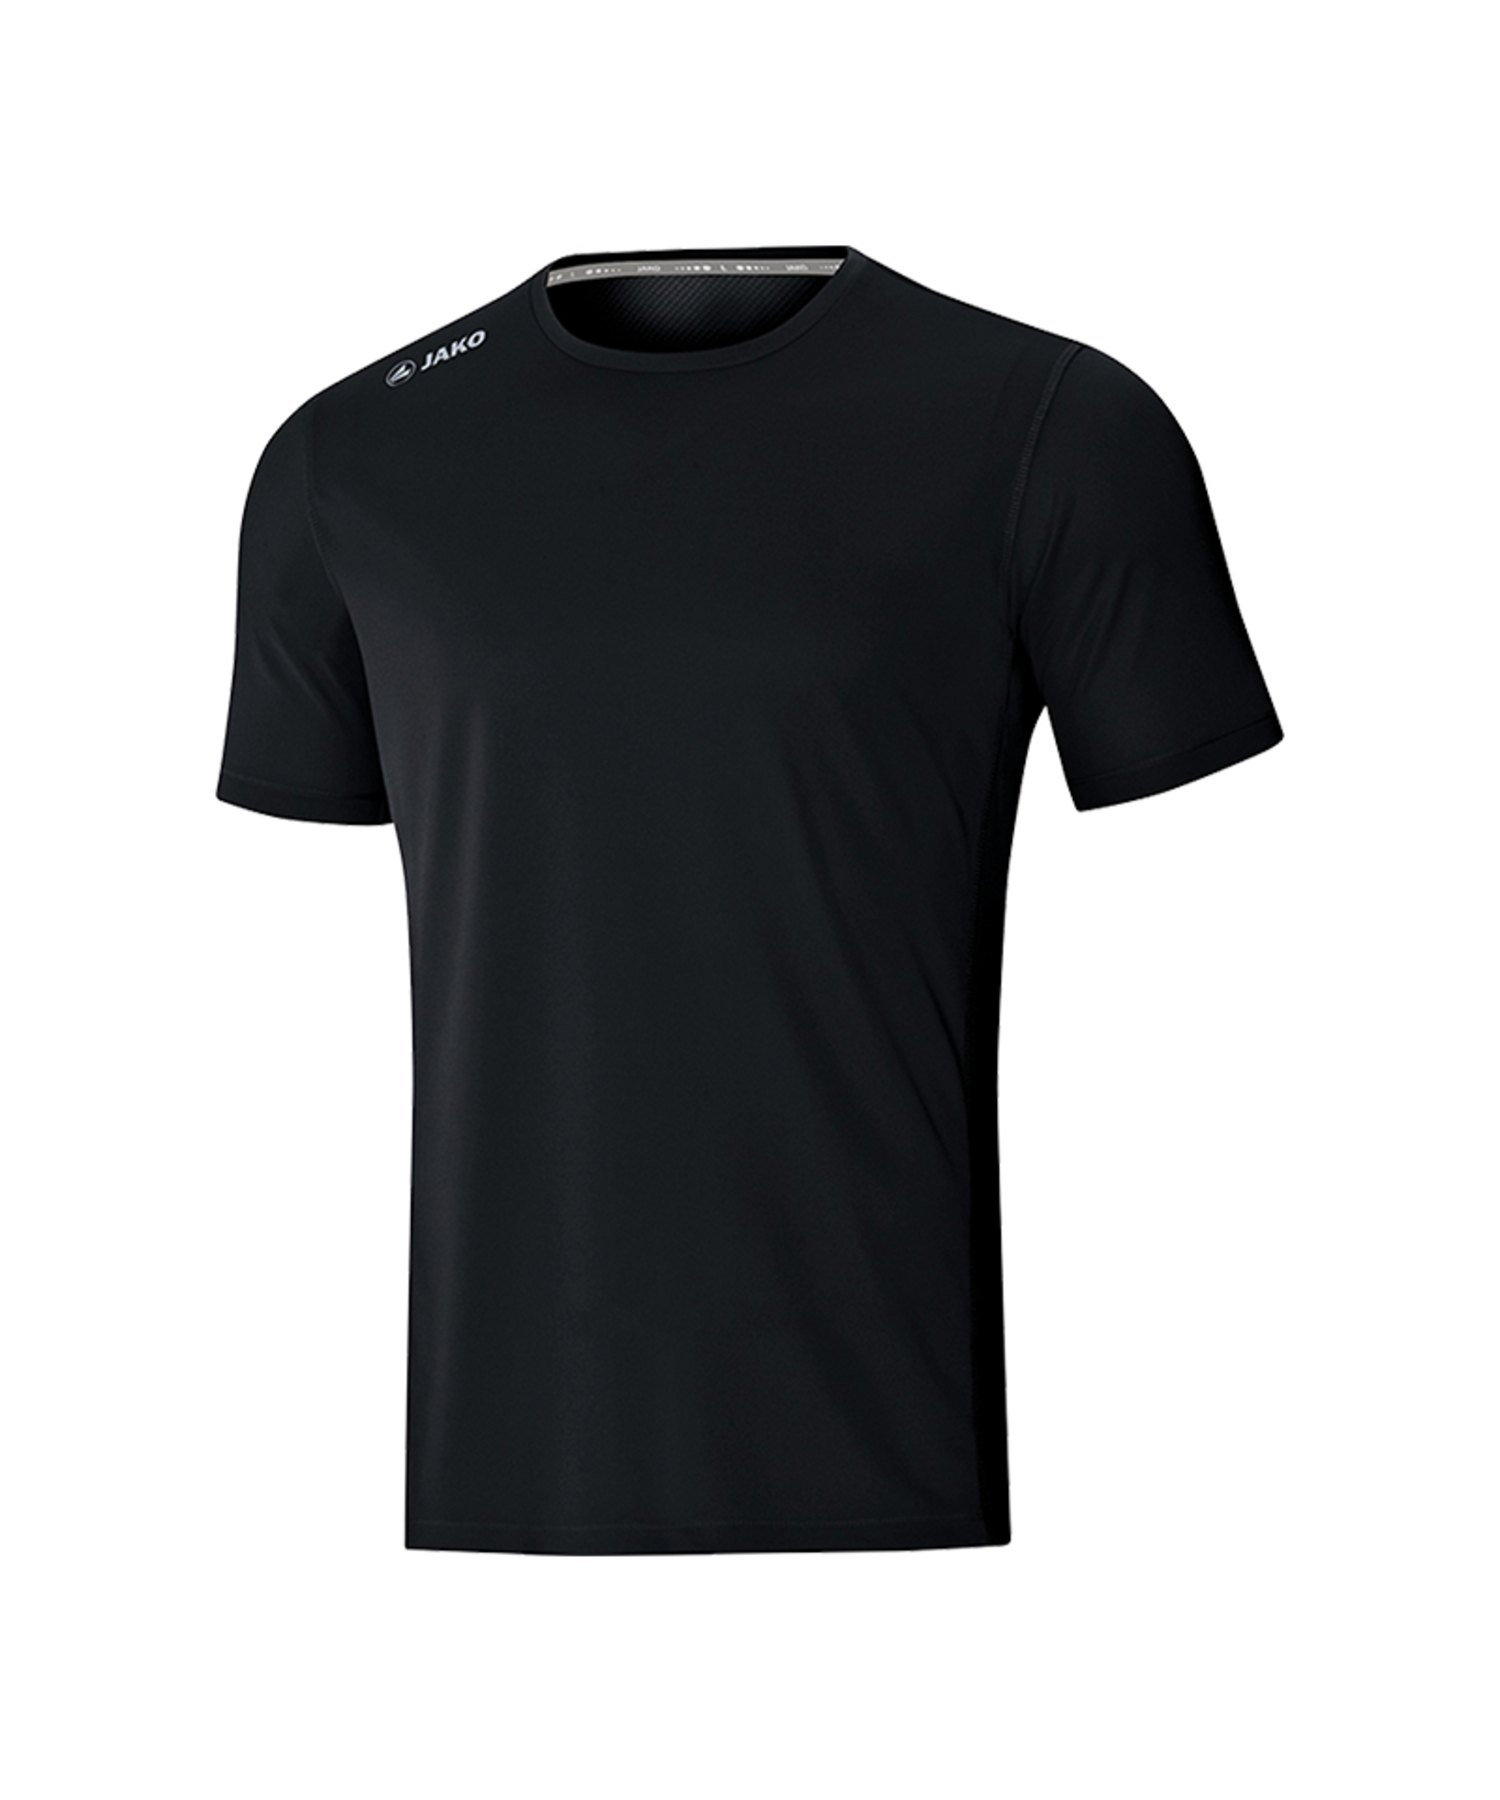 Jako Run 2.0 T-Shirt Running Kids Schwarz F08 - Schwarz